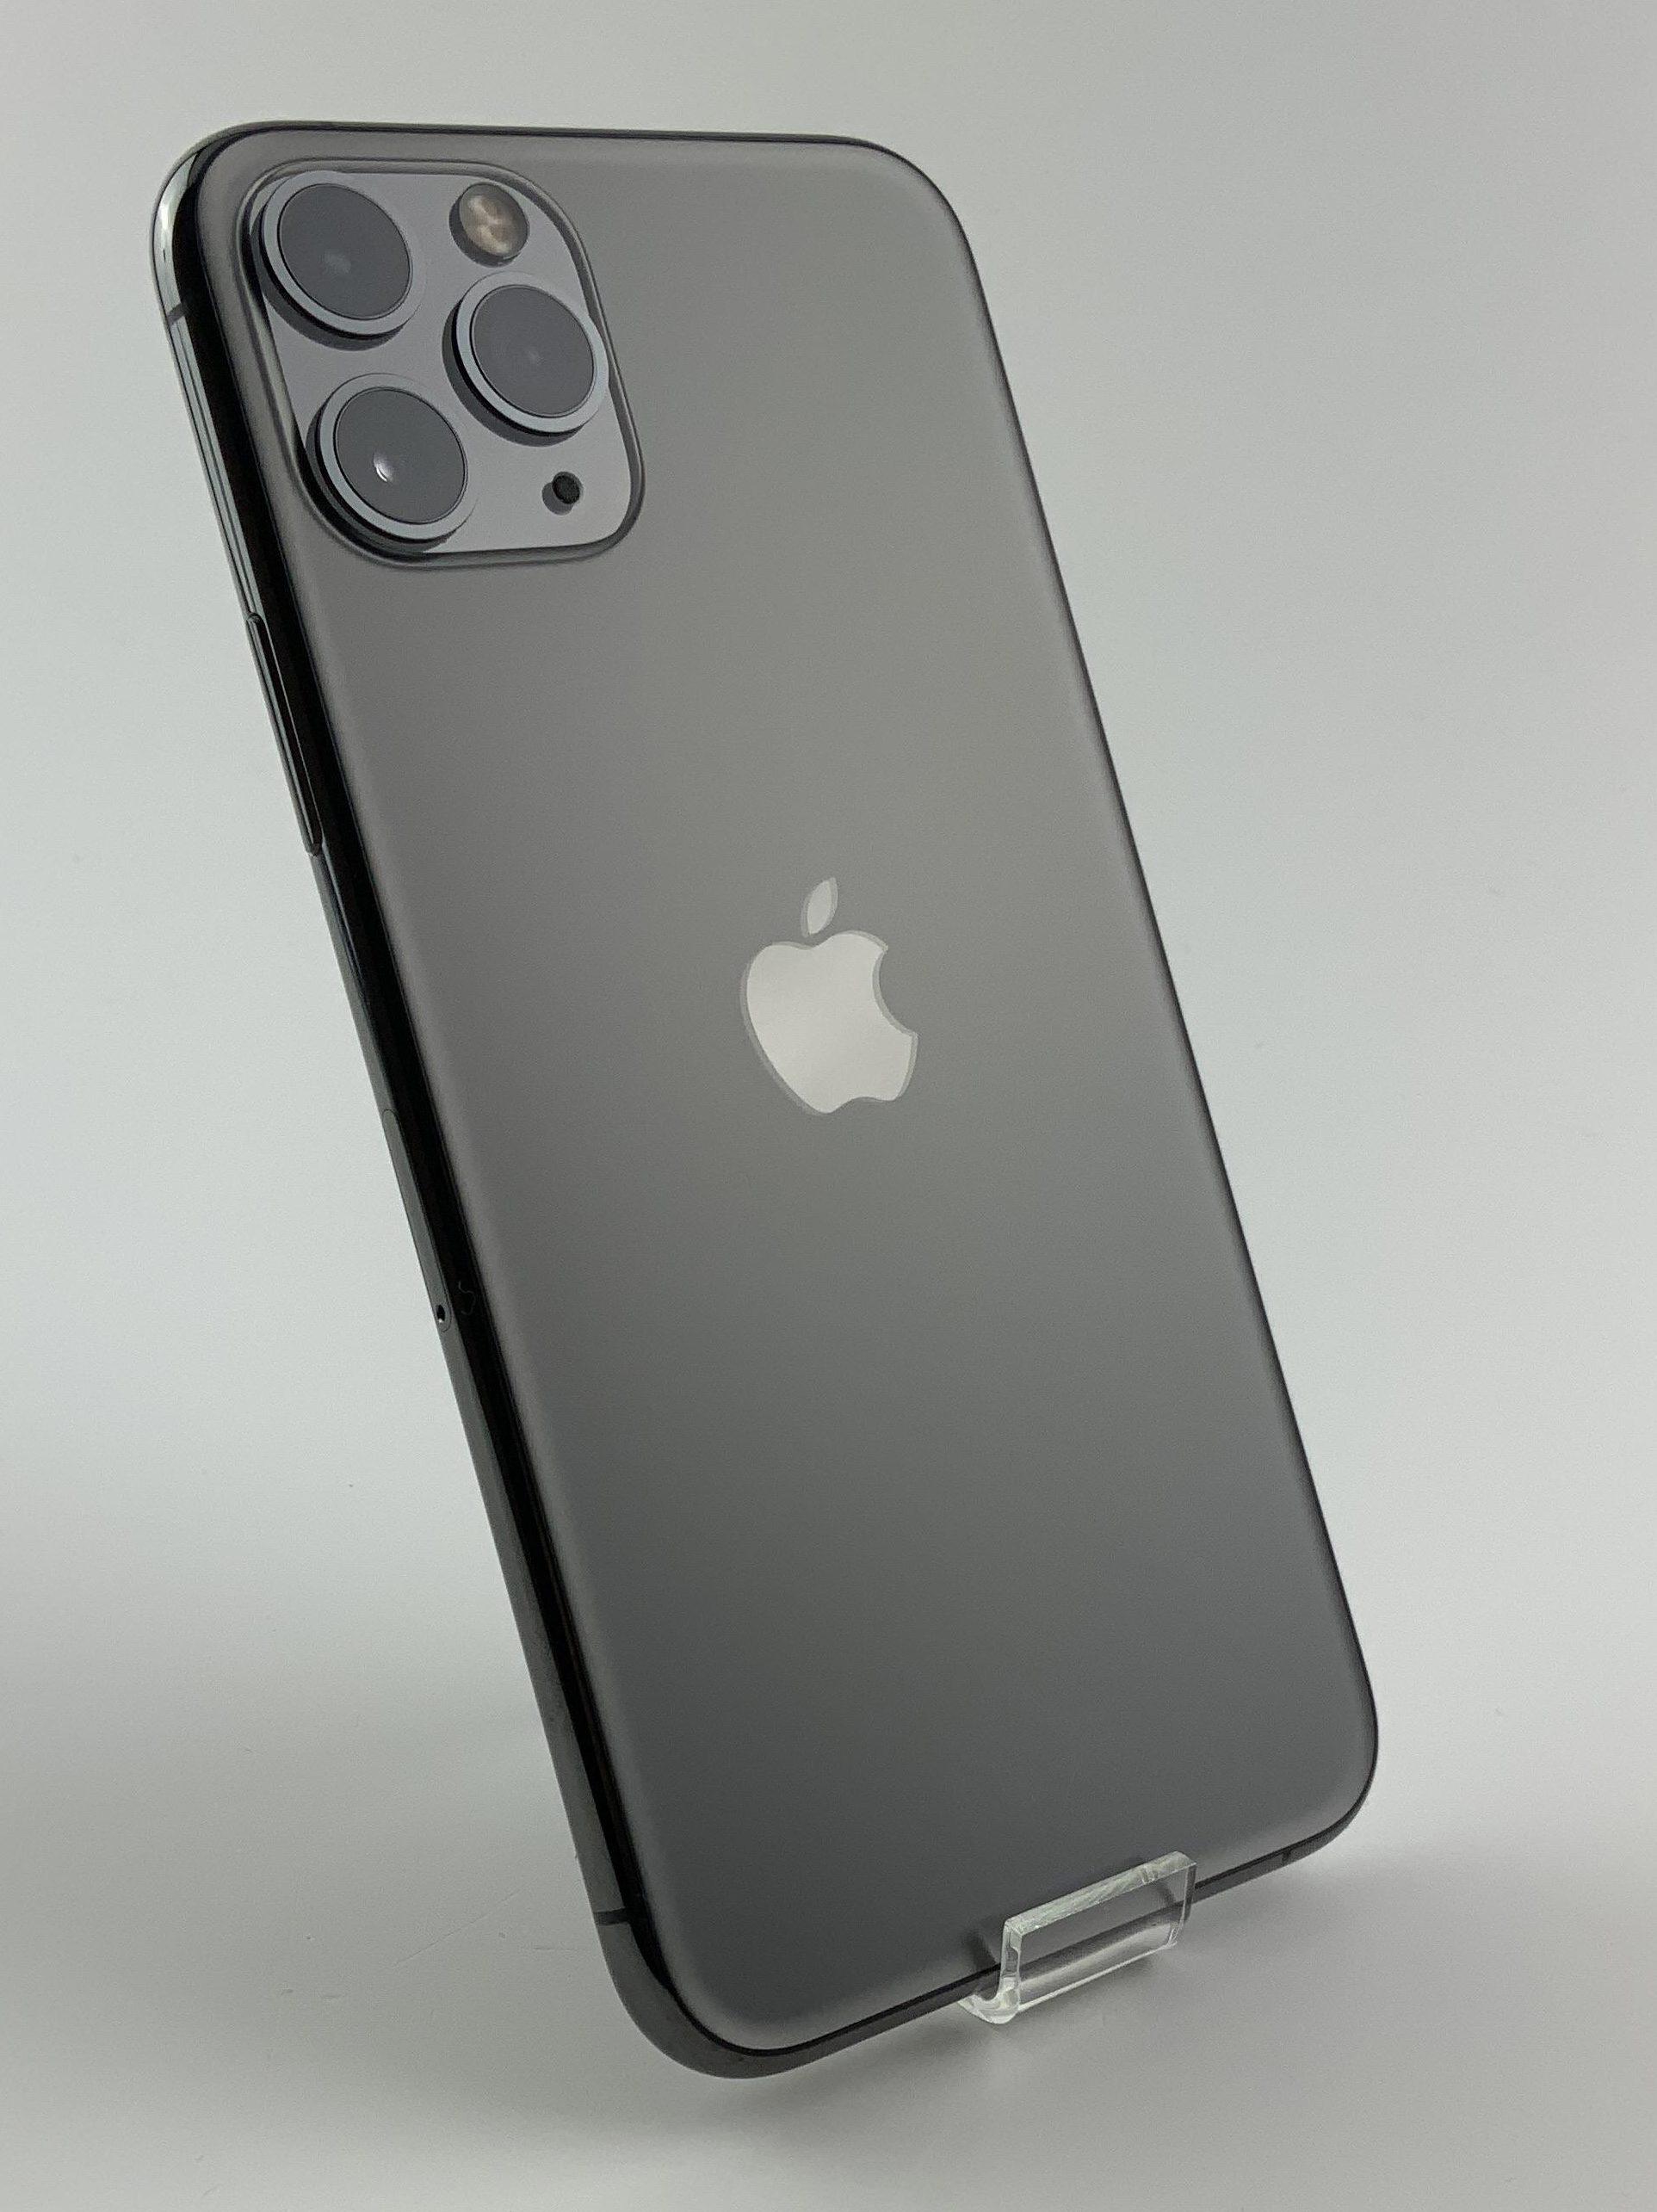 iPhone 11 Pro 256GB, 256GB, Space Gray, image 2